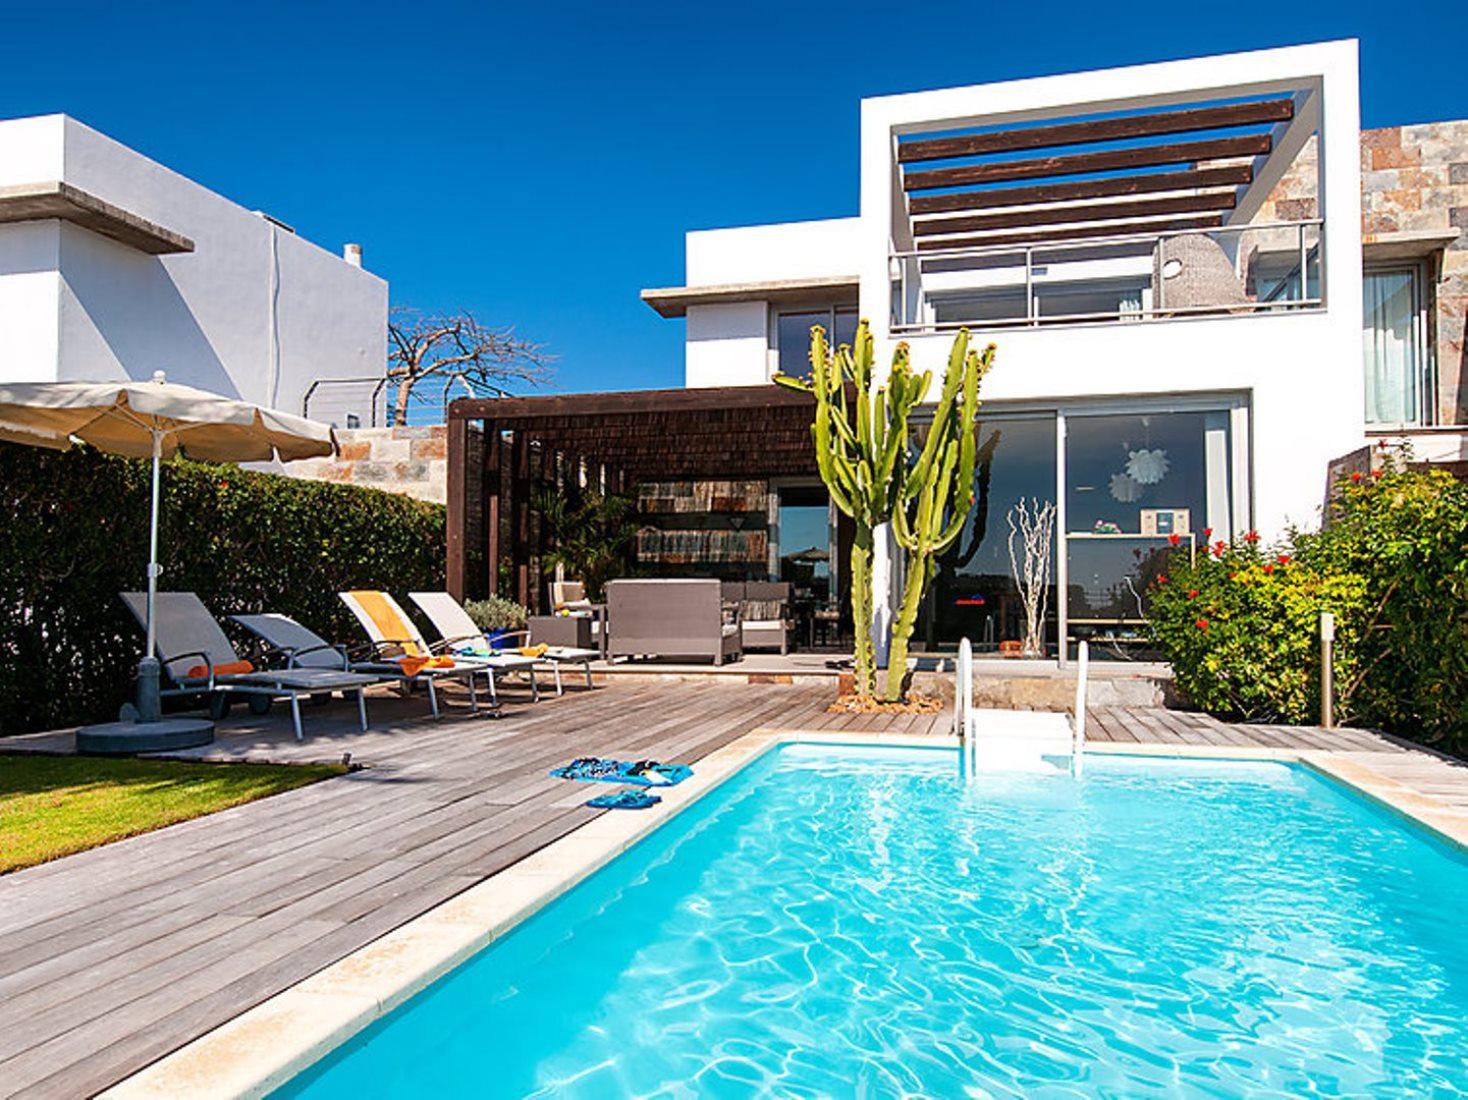 Gran Canaria_Salobre Golf Villas - Holiday Rental Golfers14